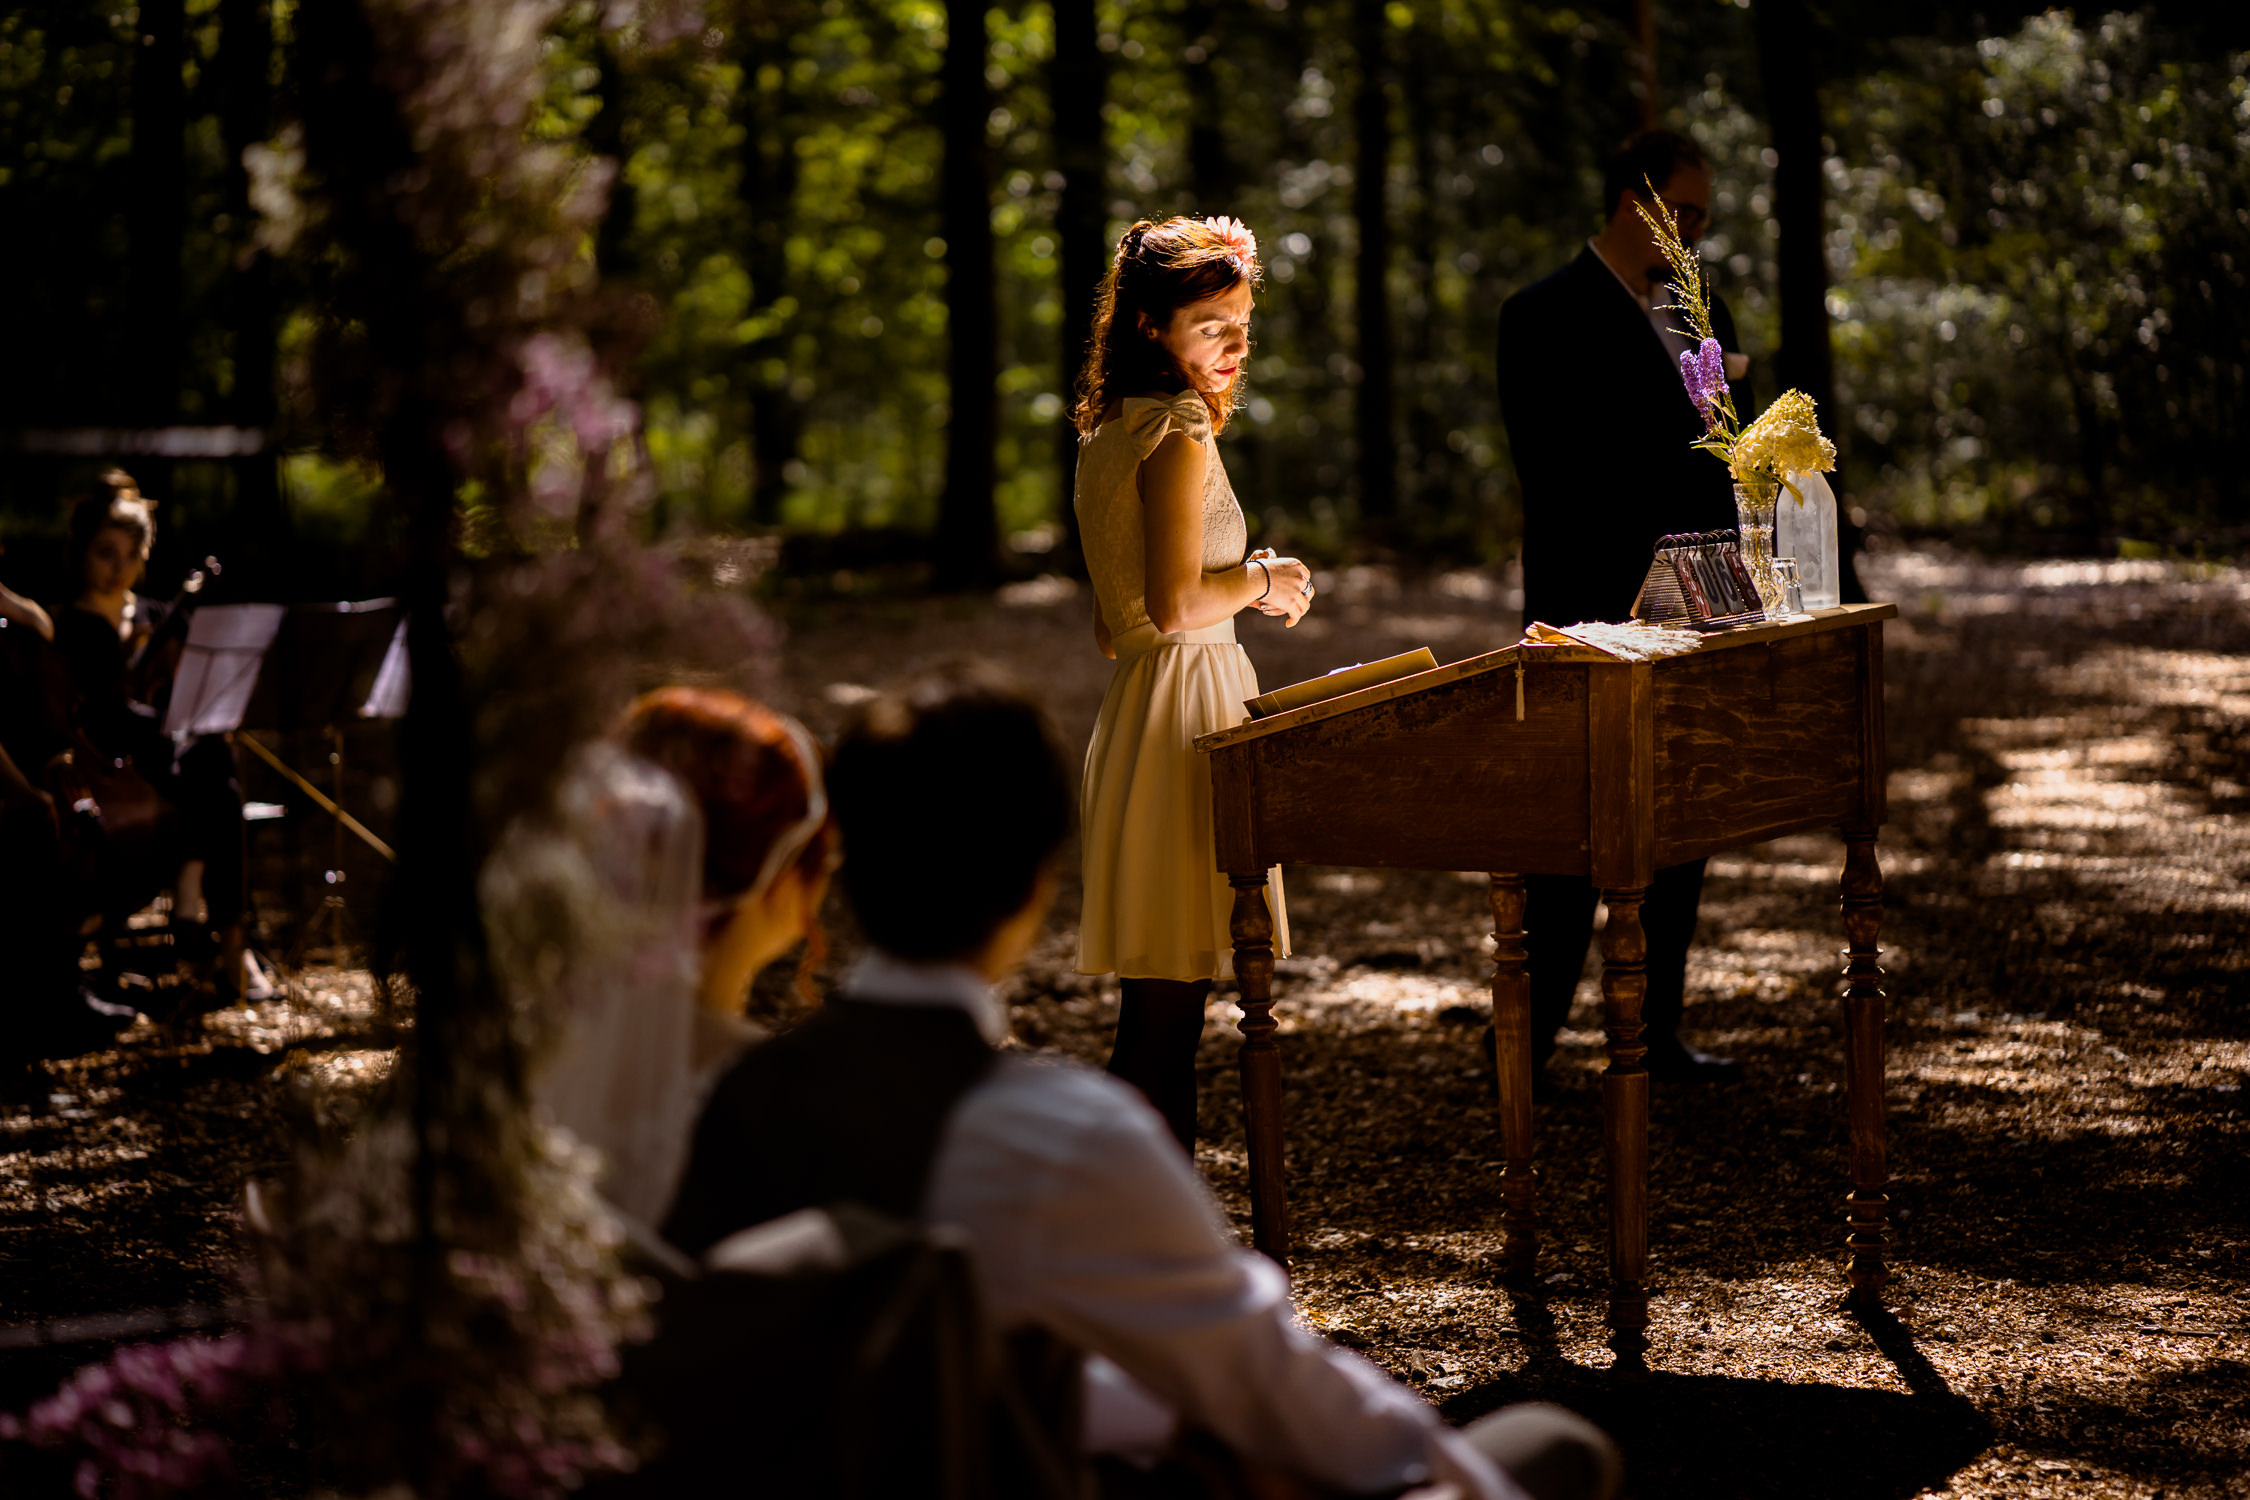 amsterdam-wedding-photographer-bruidsfotografie-trouwfotograaf-mark-hadden-Lucie-Luuk-096.jpg